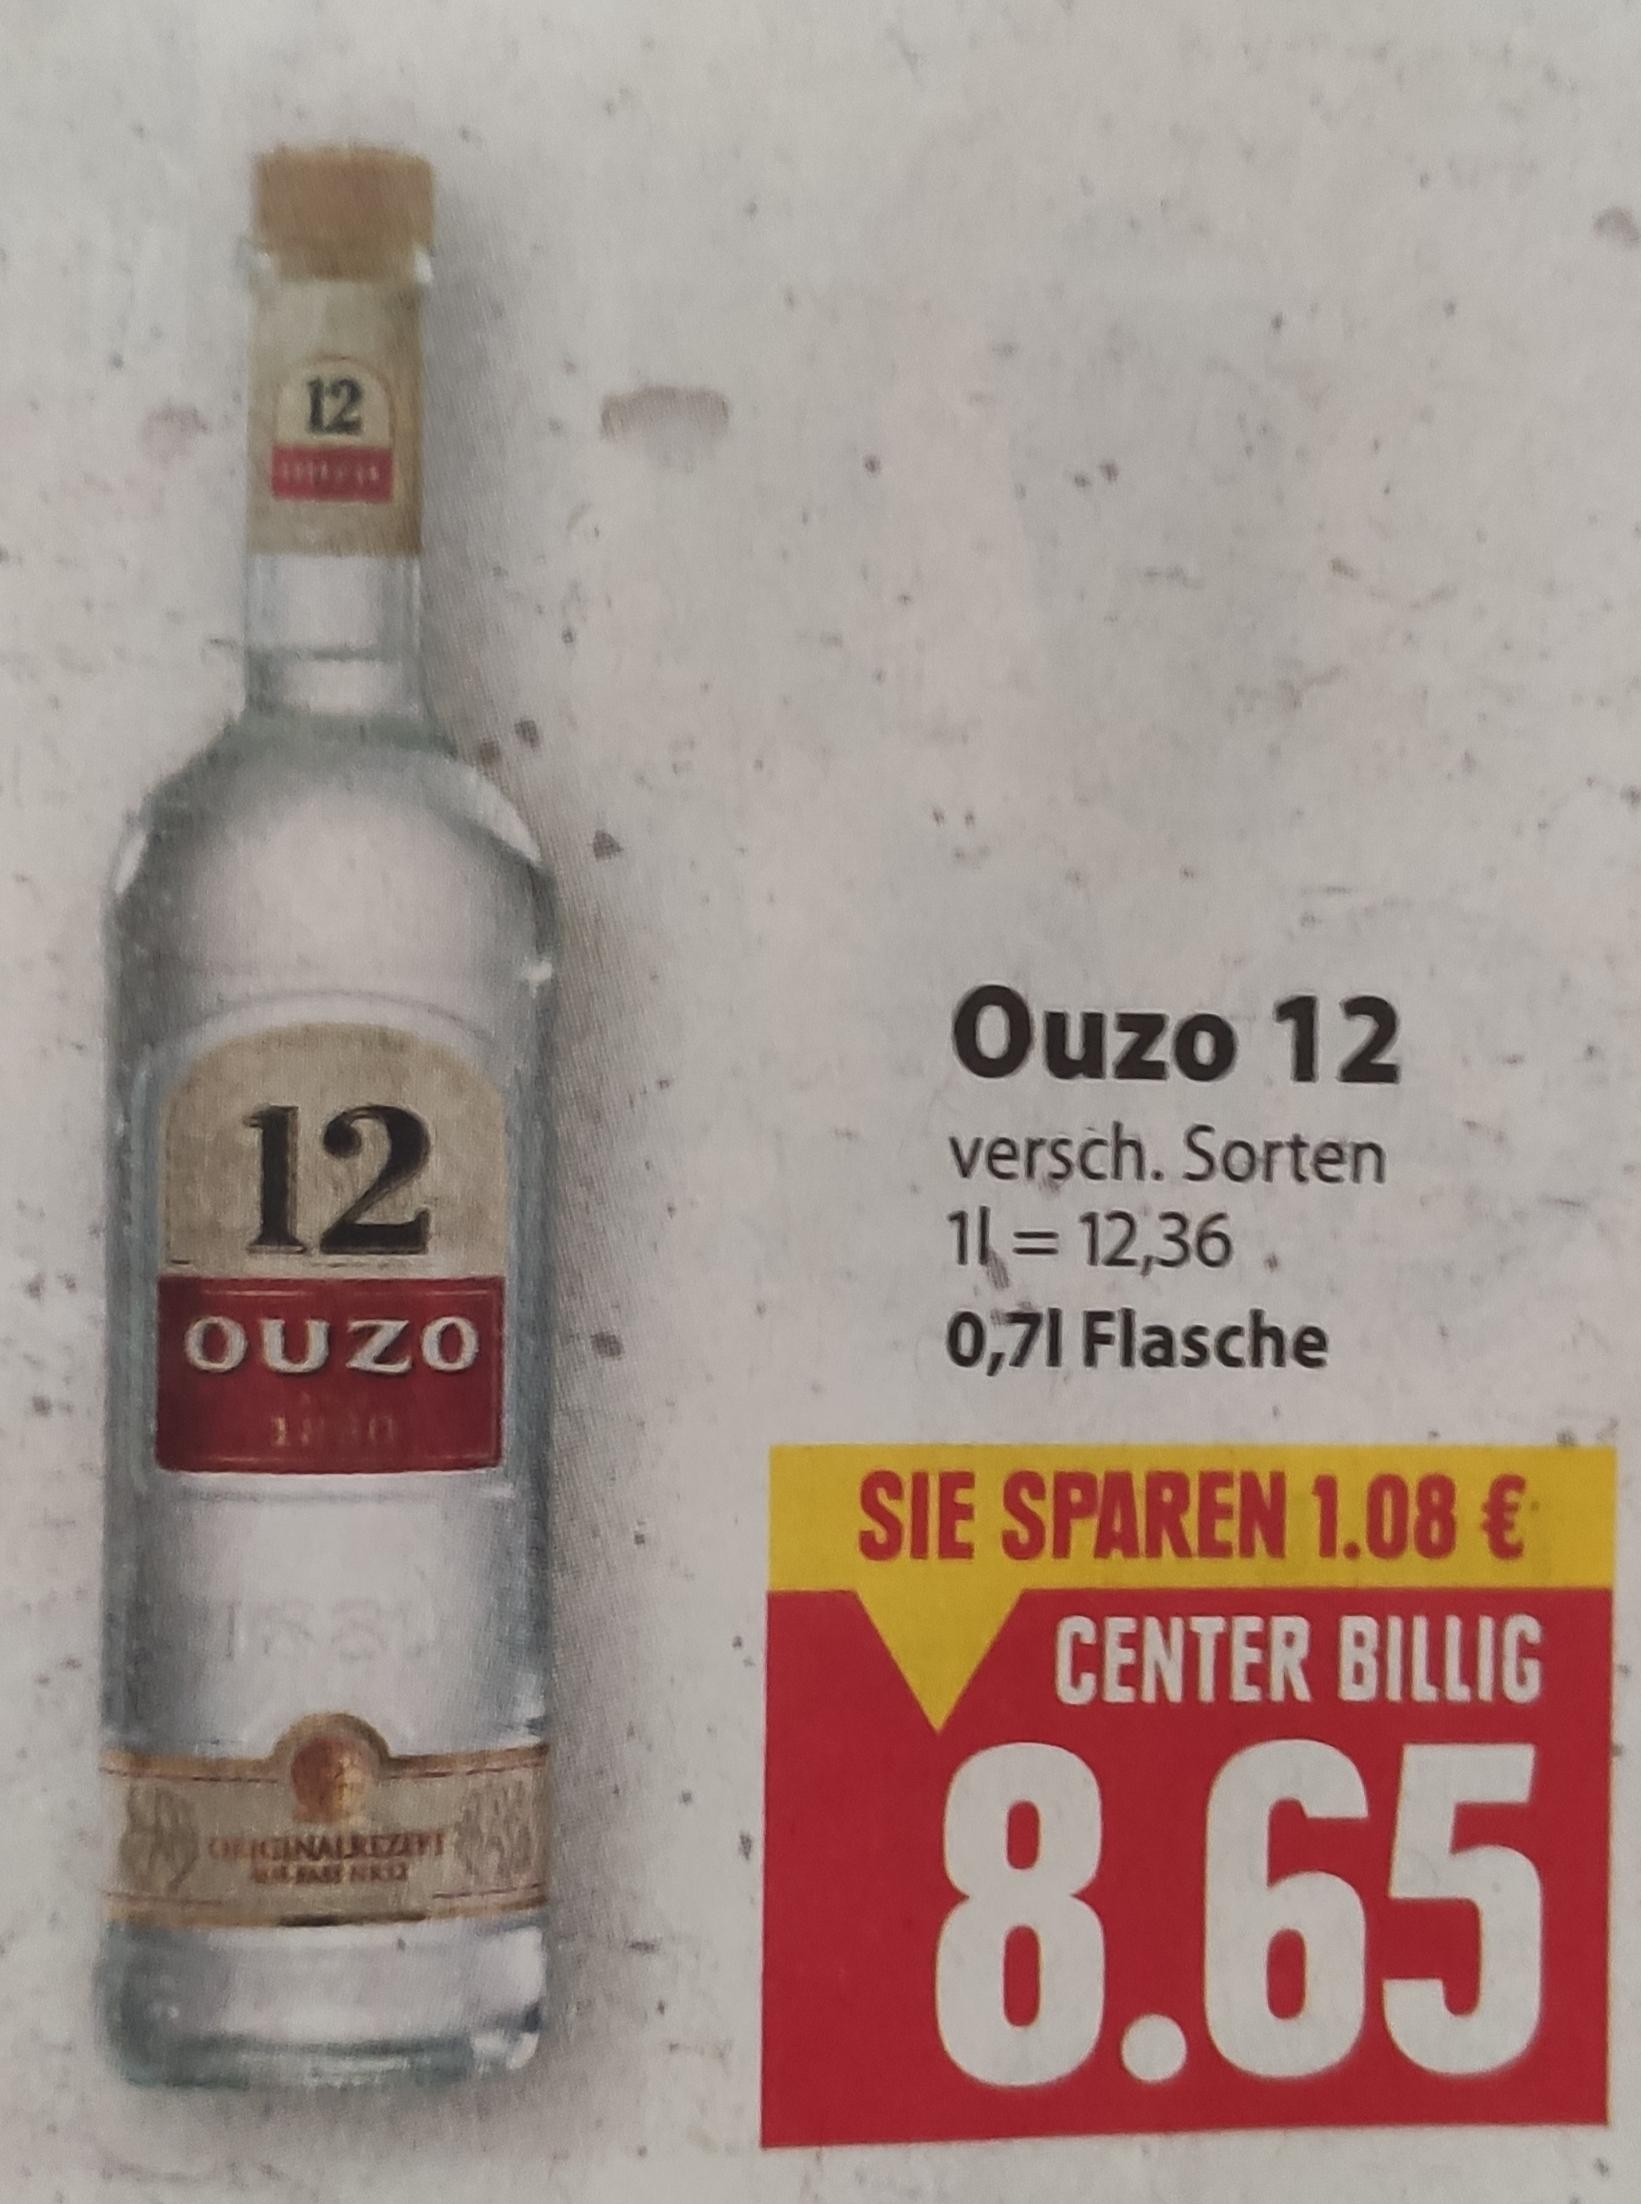 [Edeka Center Minden-Hannover] Ouzo 12 oder Ouzo 12 Gold mit Coupon für 7,65€